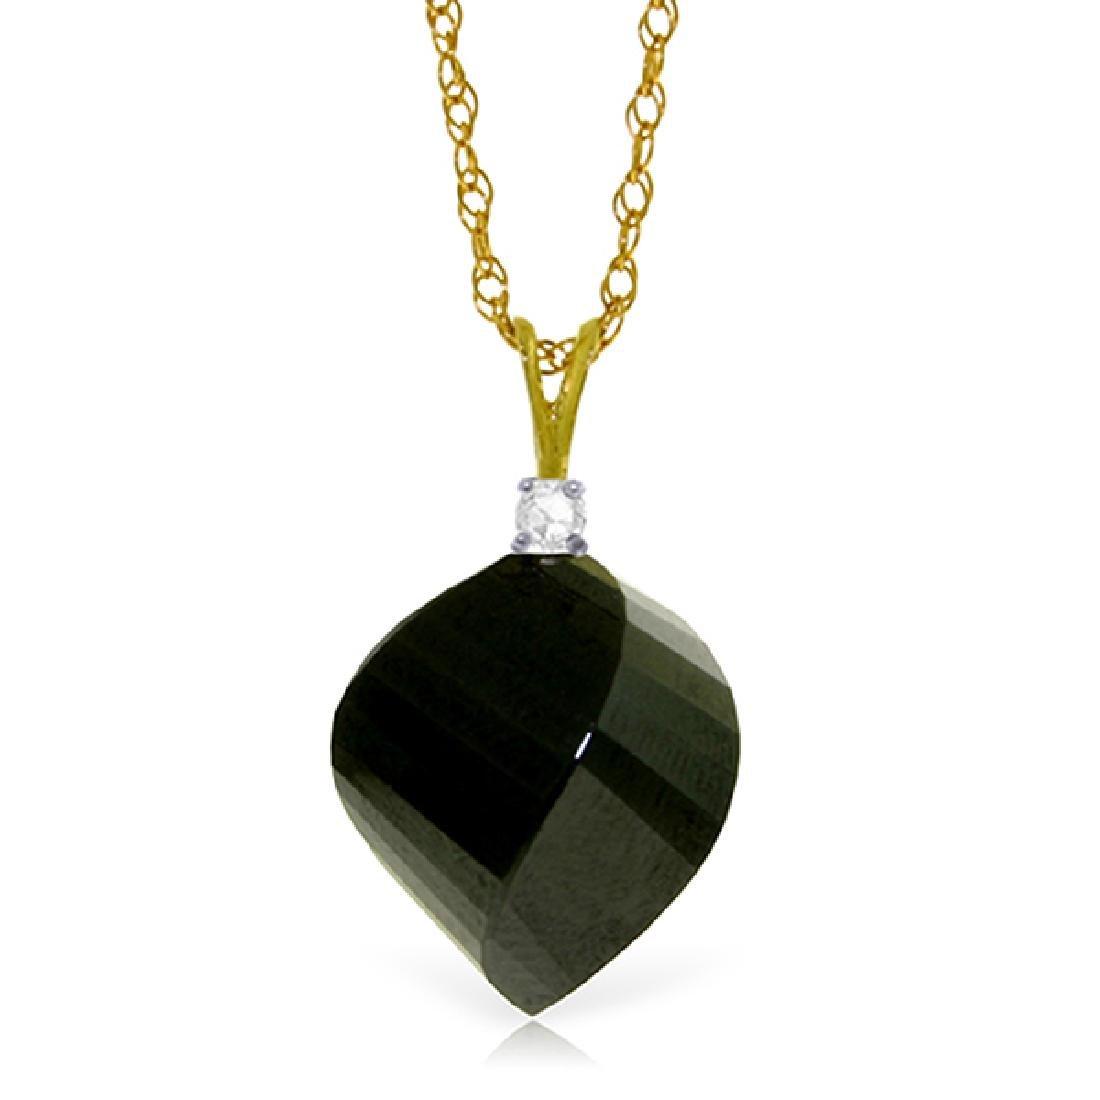 Genuine 15.55 ctw Black Spinel & Diamond Necklace